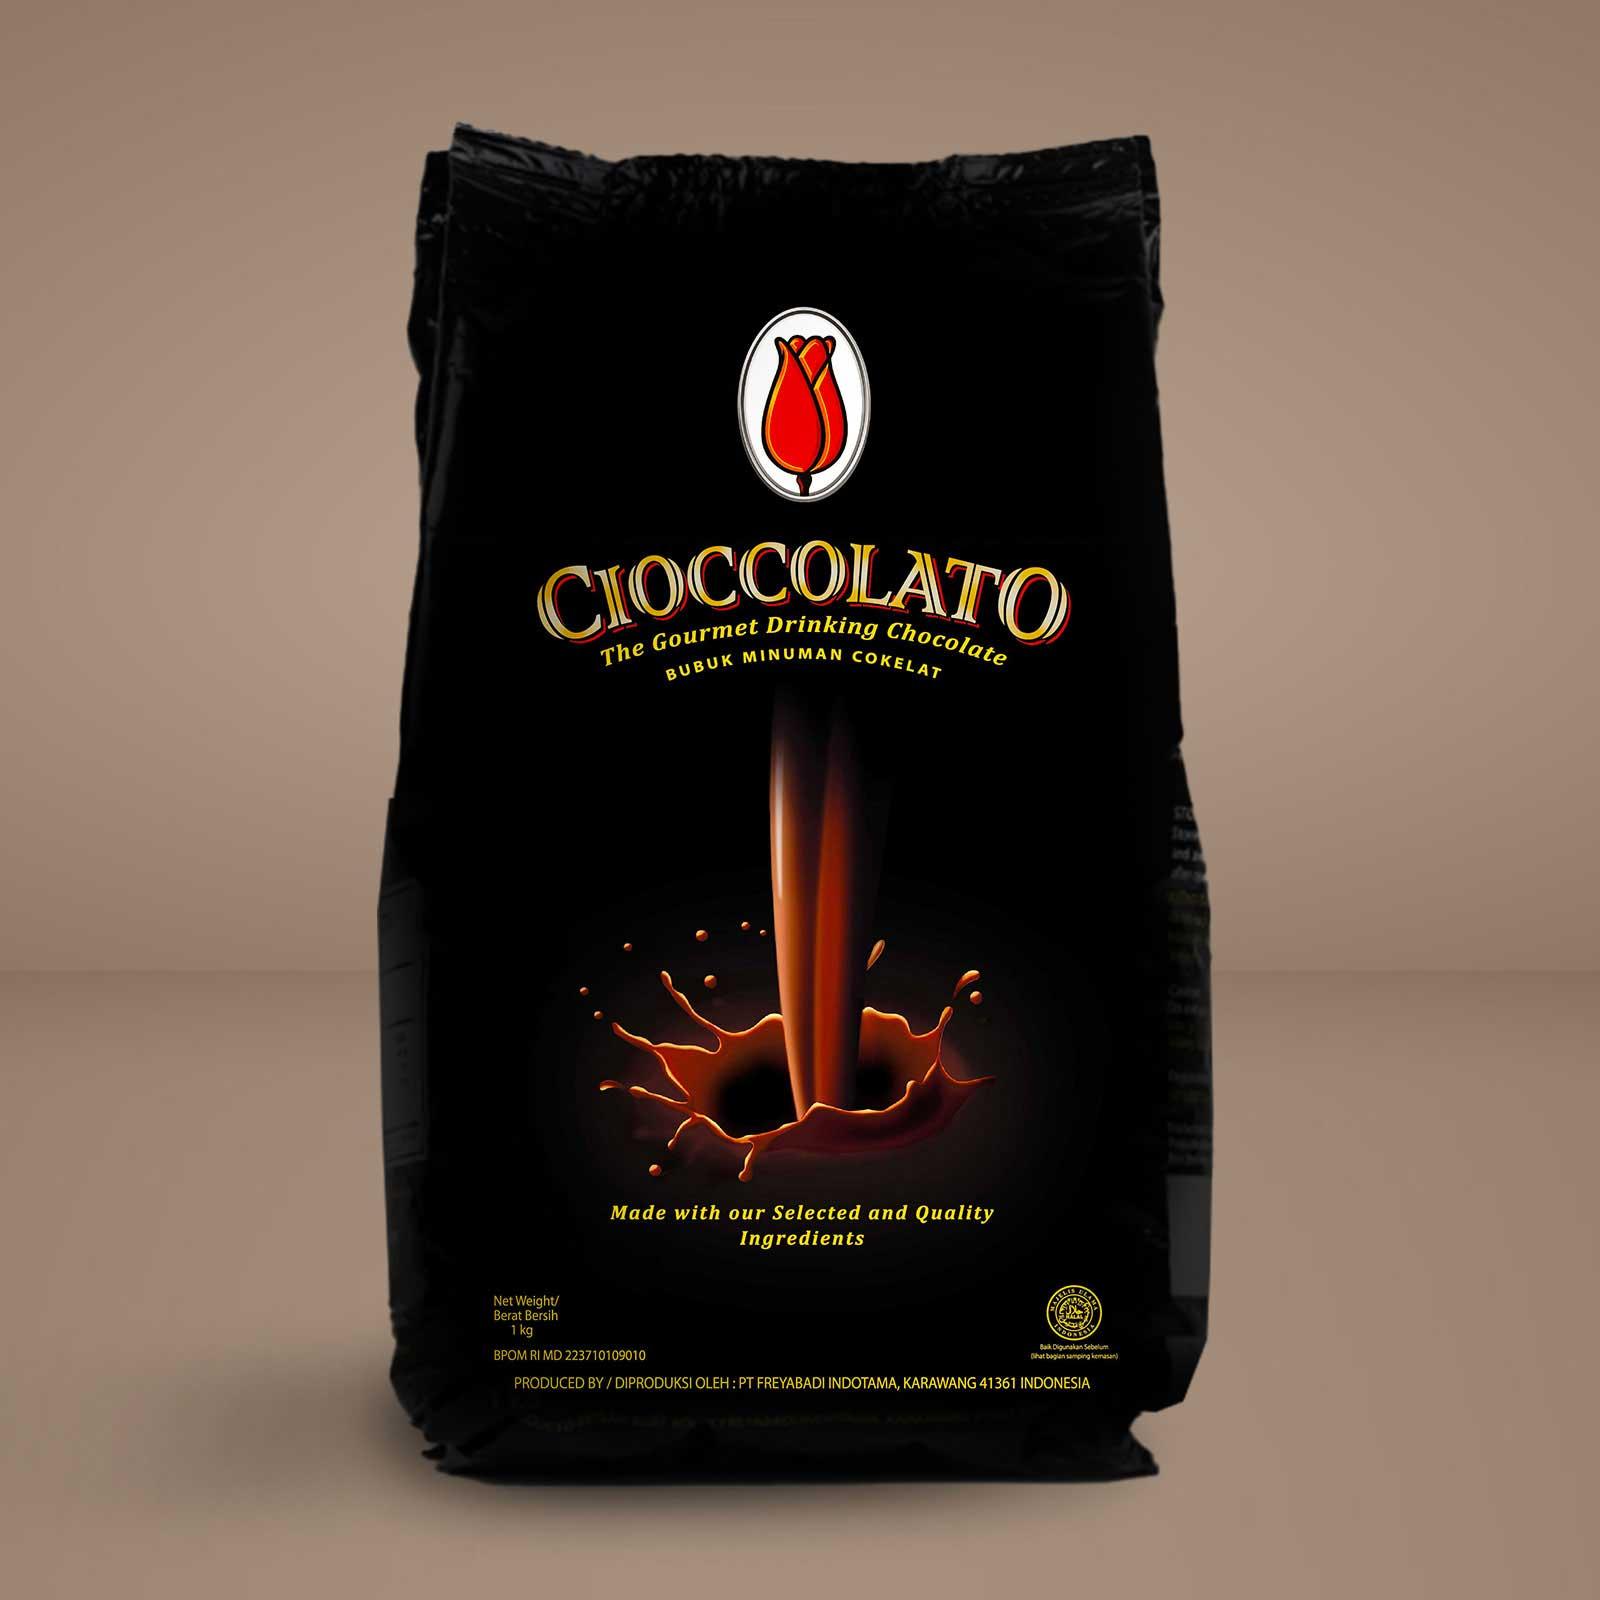 cioccolato-Chocolate-syrup-front-1